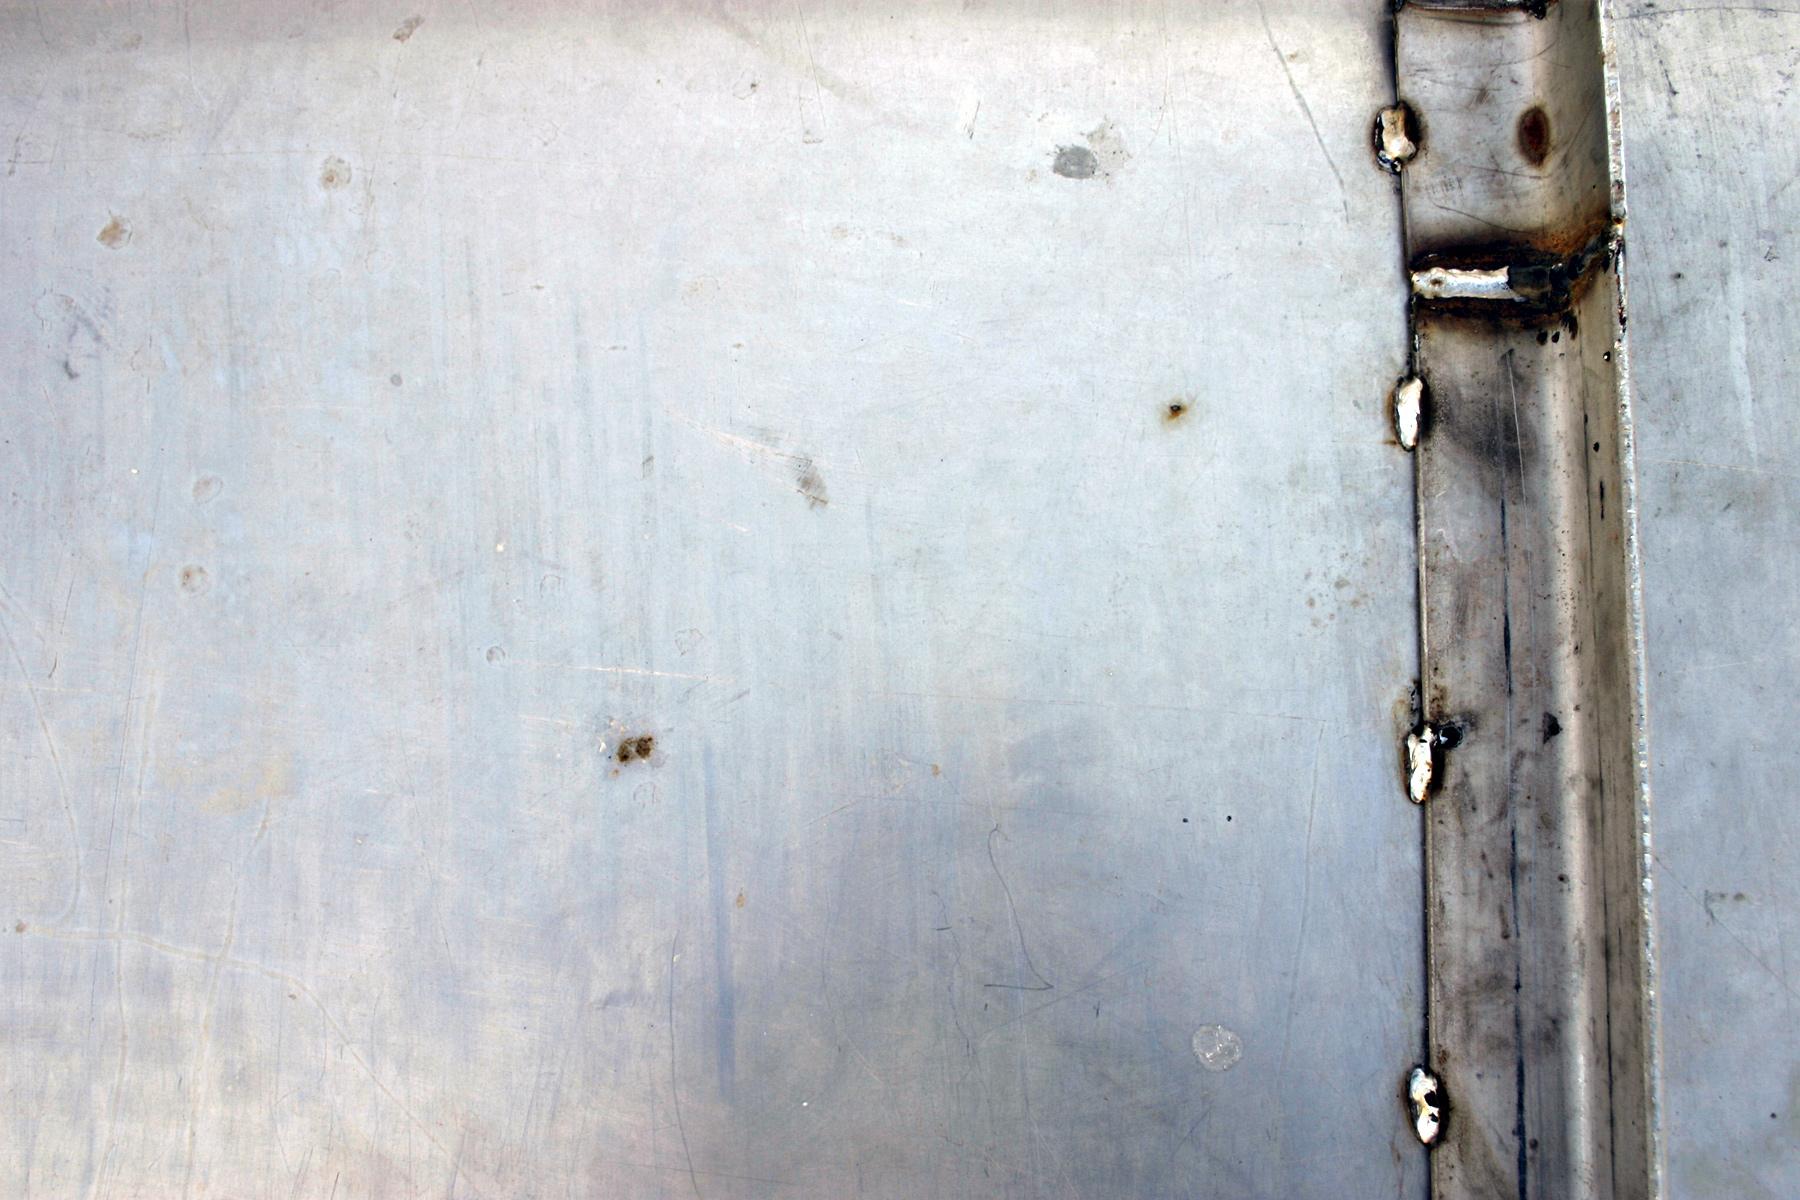 Brushed steel photo